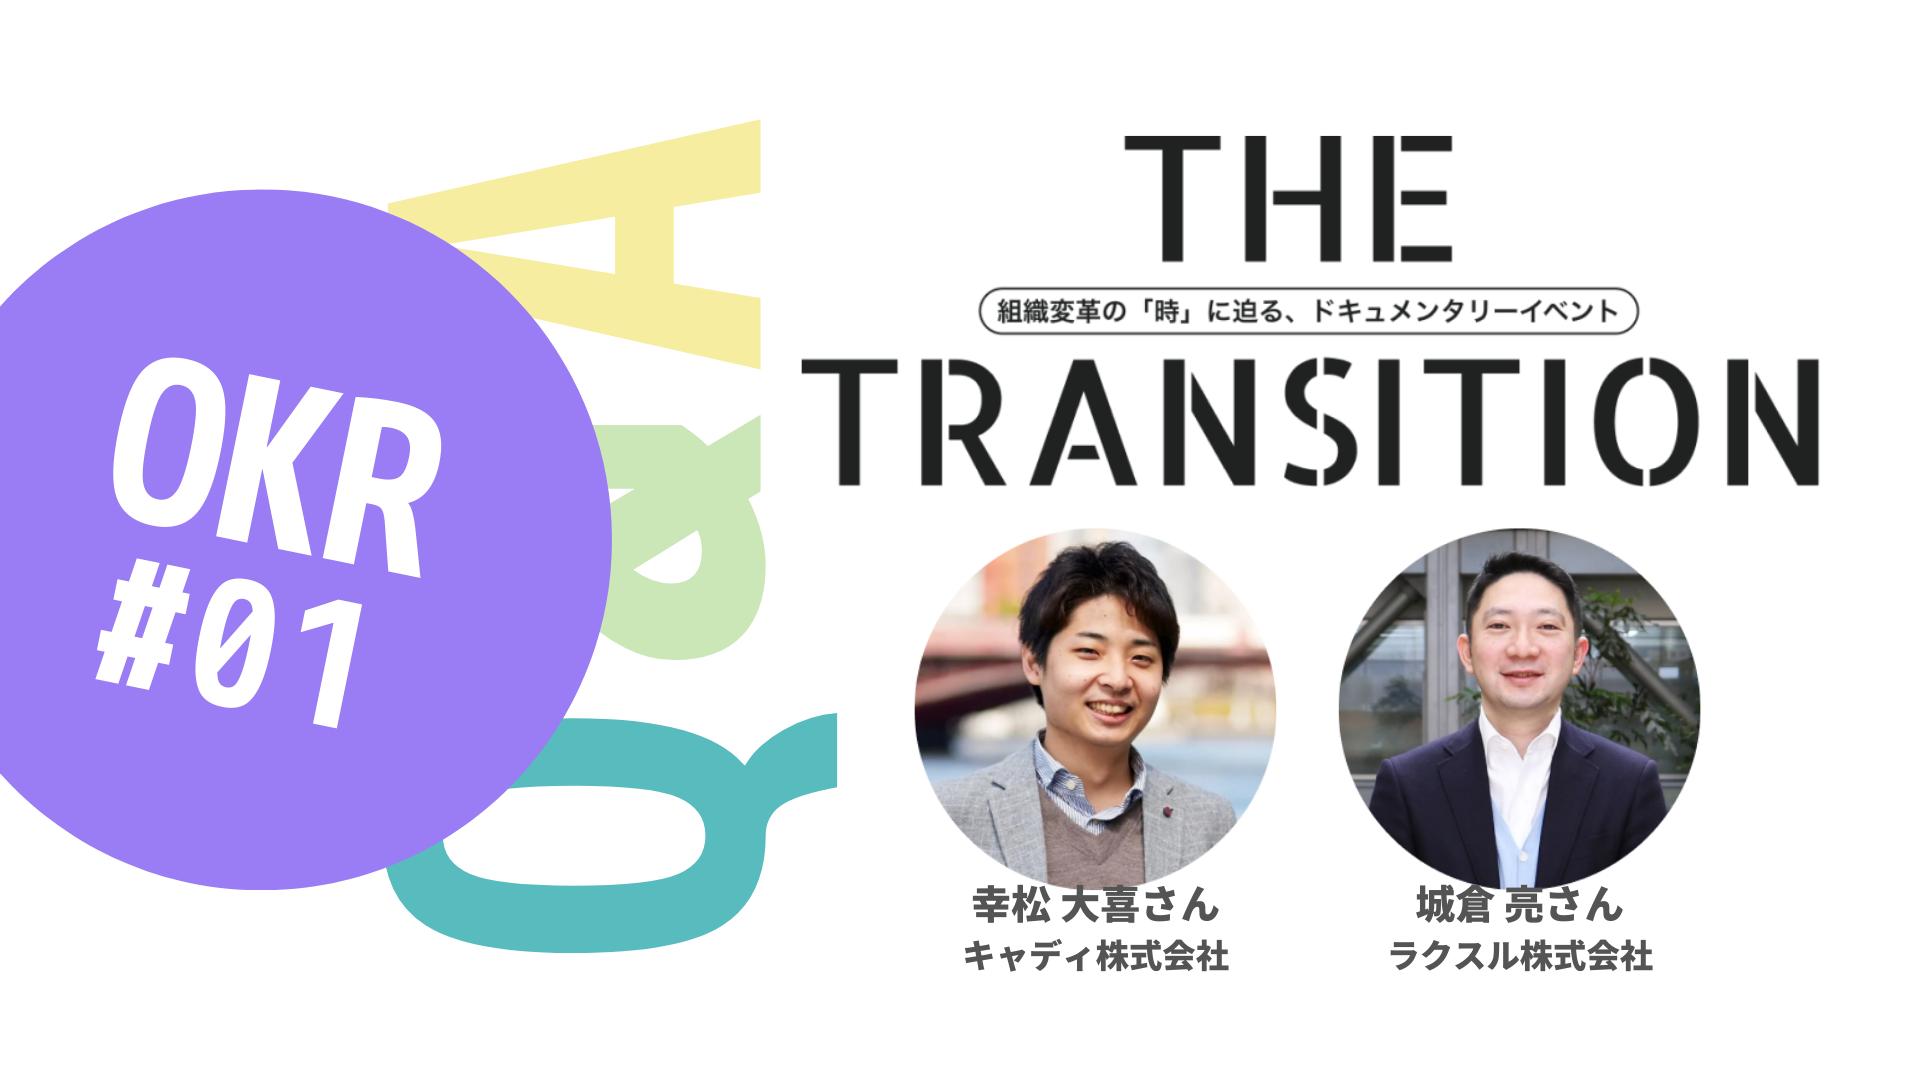 【Q&A・11選】「OKR」の導入・管理のコツは?【THE TRANSITION「OKR」#01】